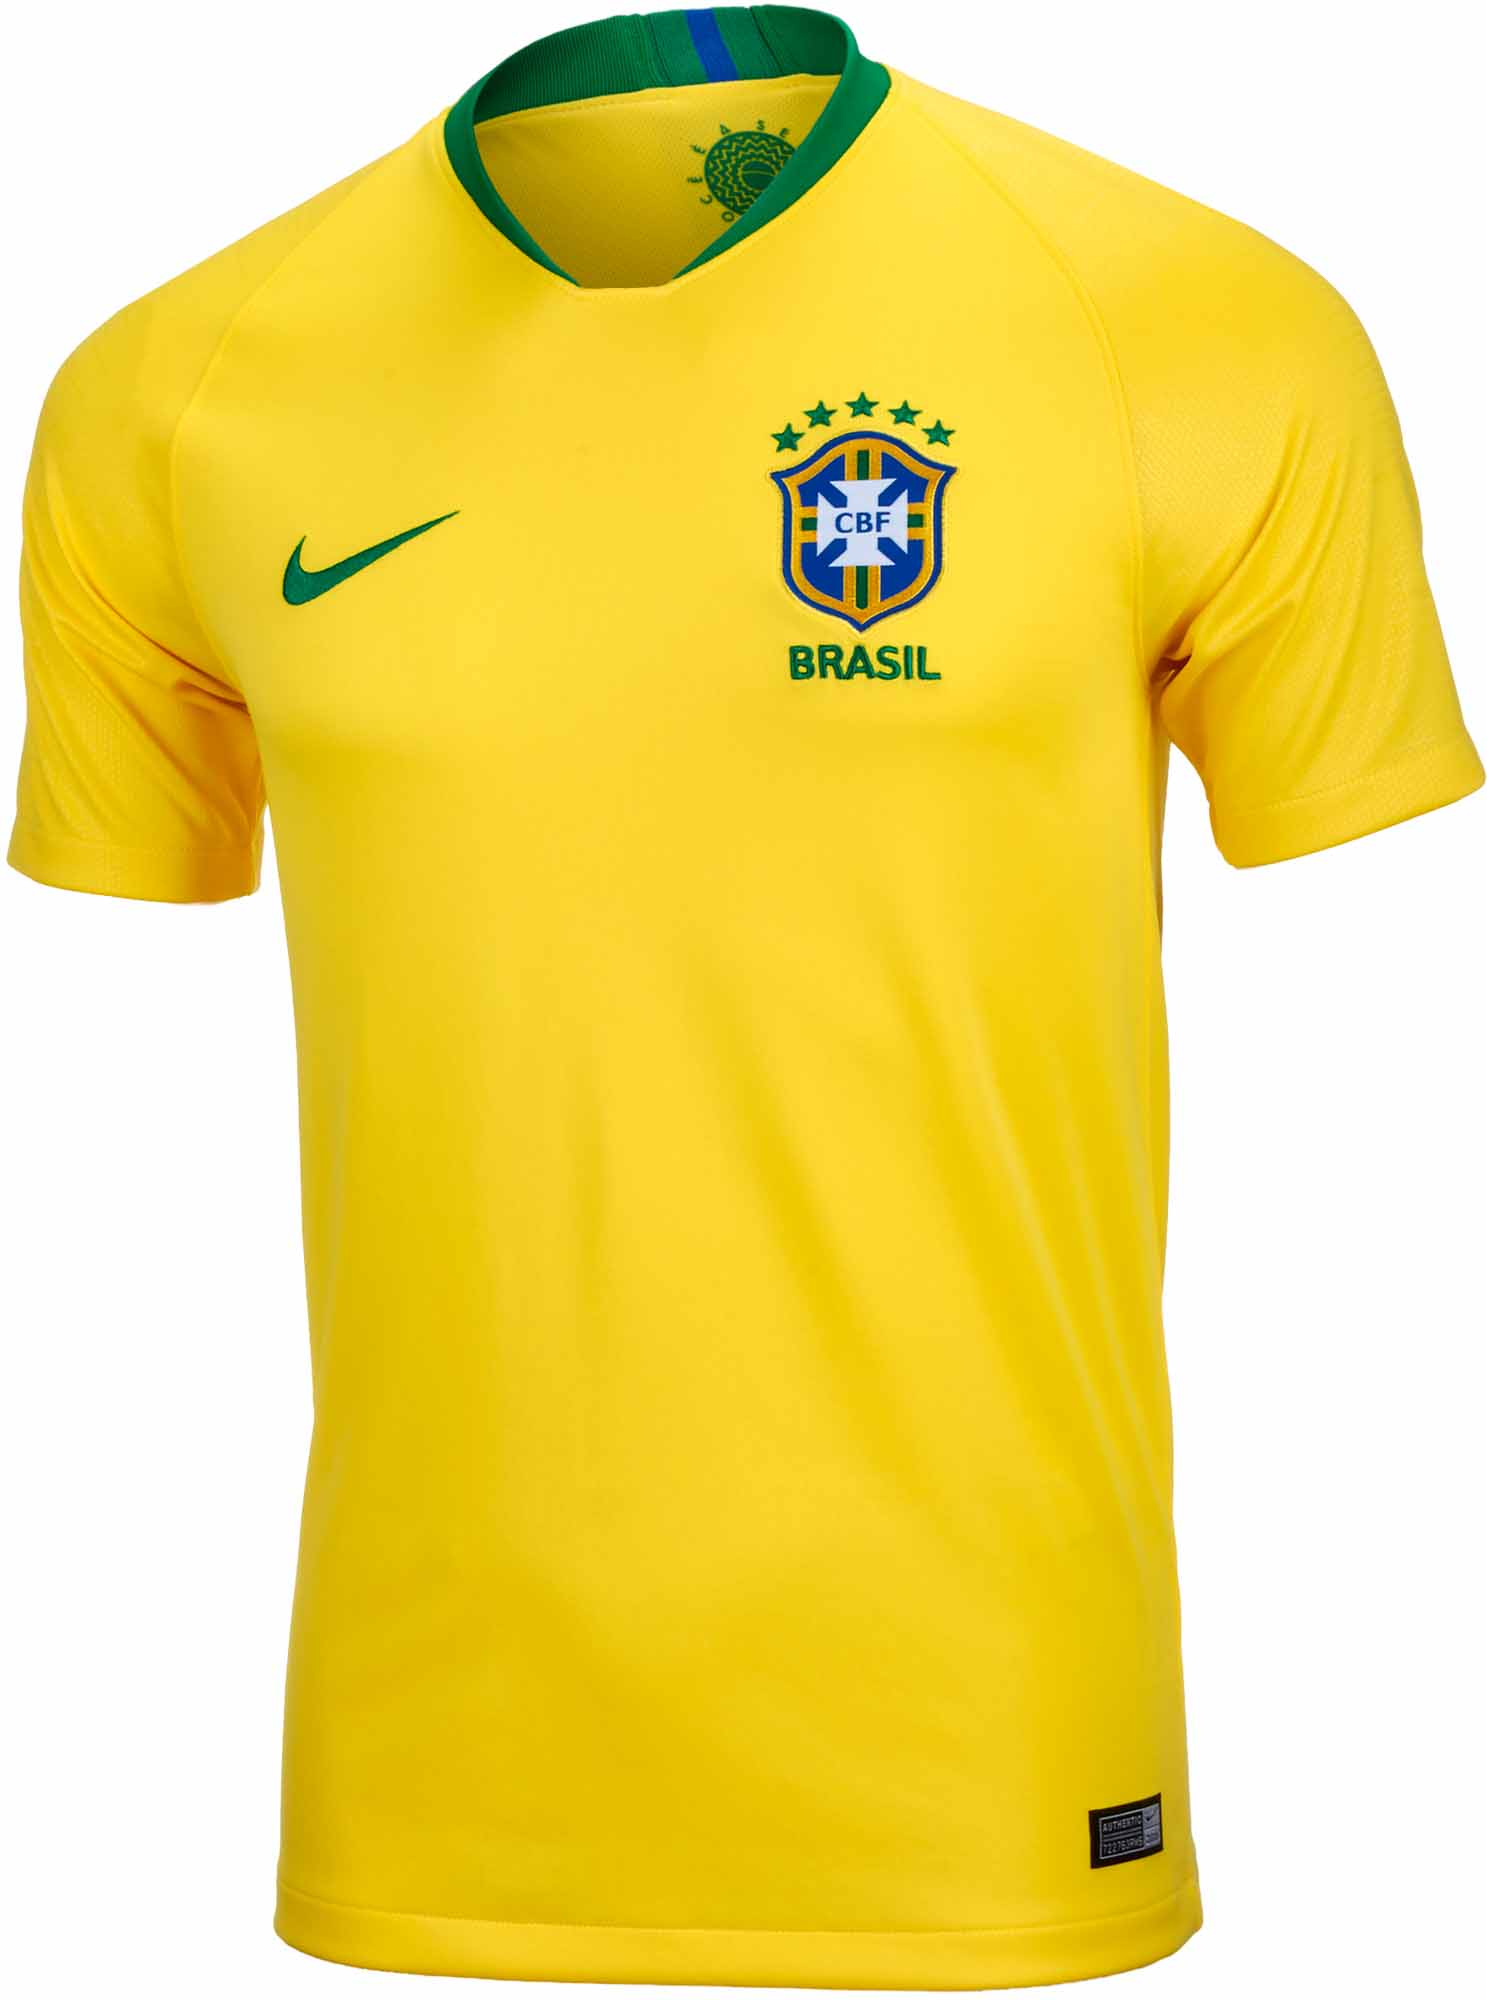 3d390ffd1 Nike Brazil Home Jersey 2018-19 - SoccerPro.com